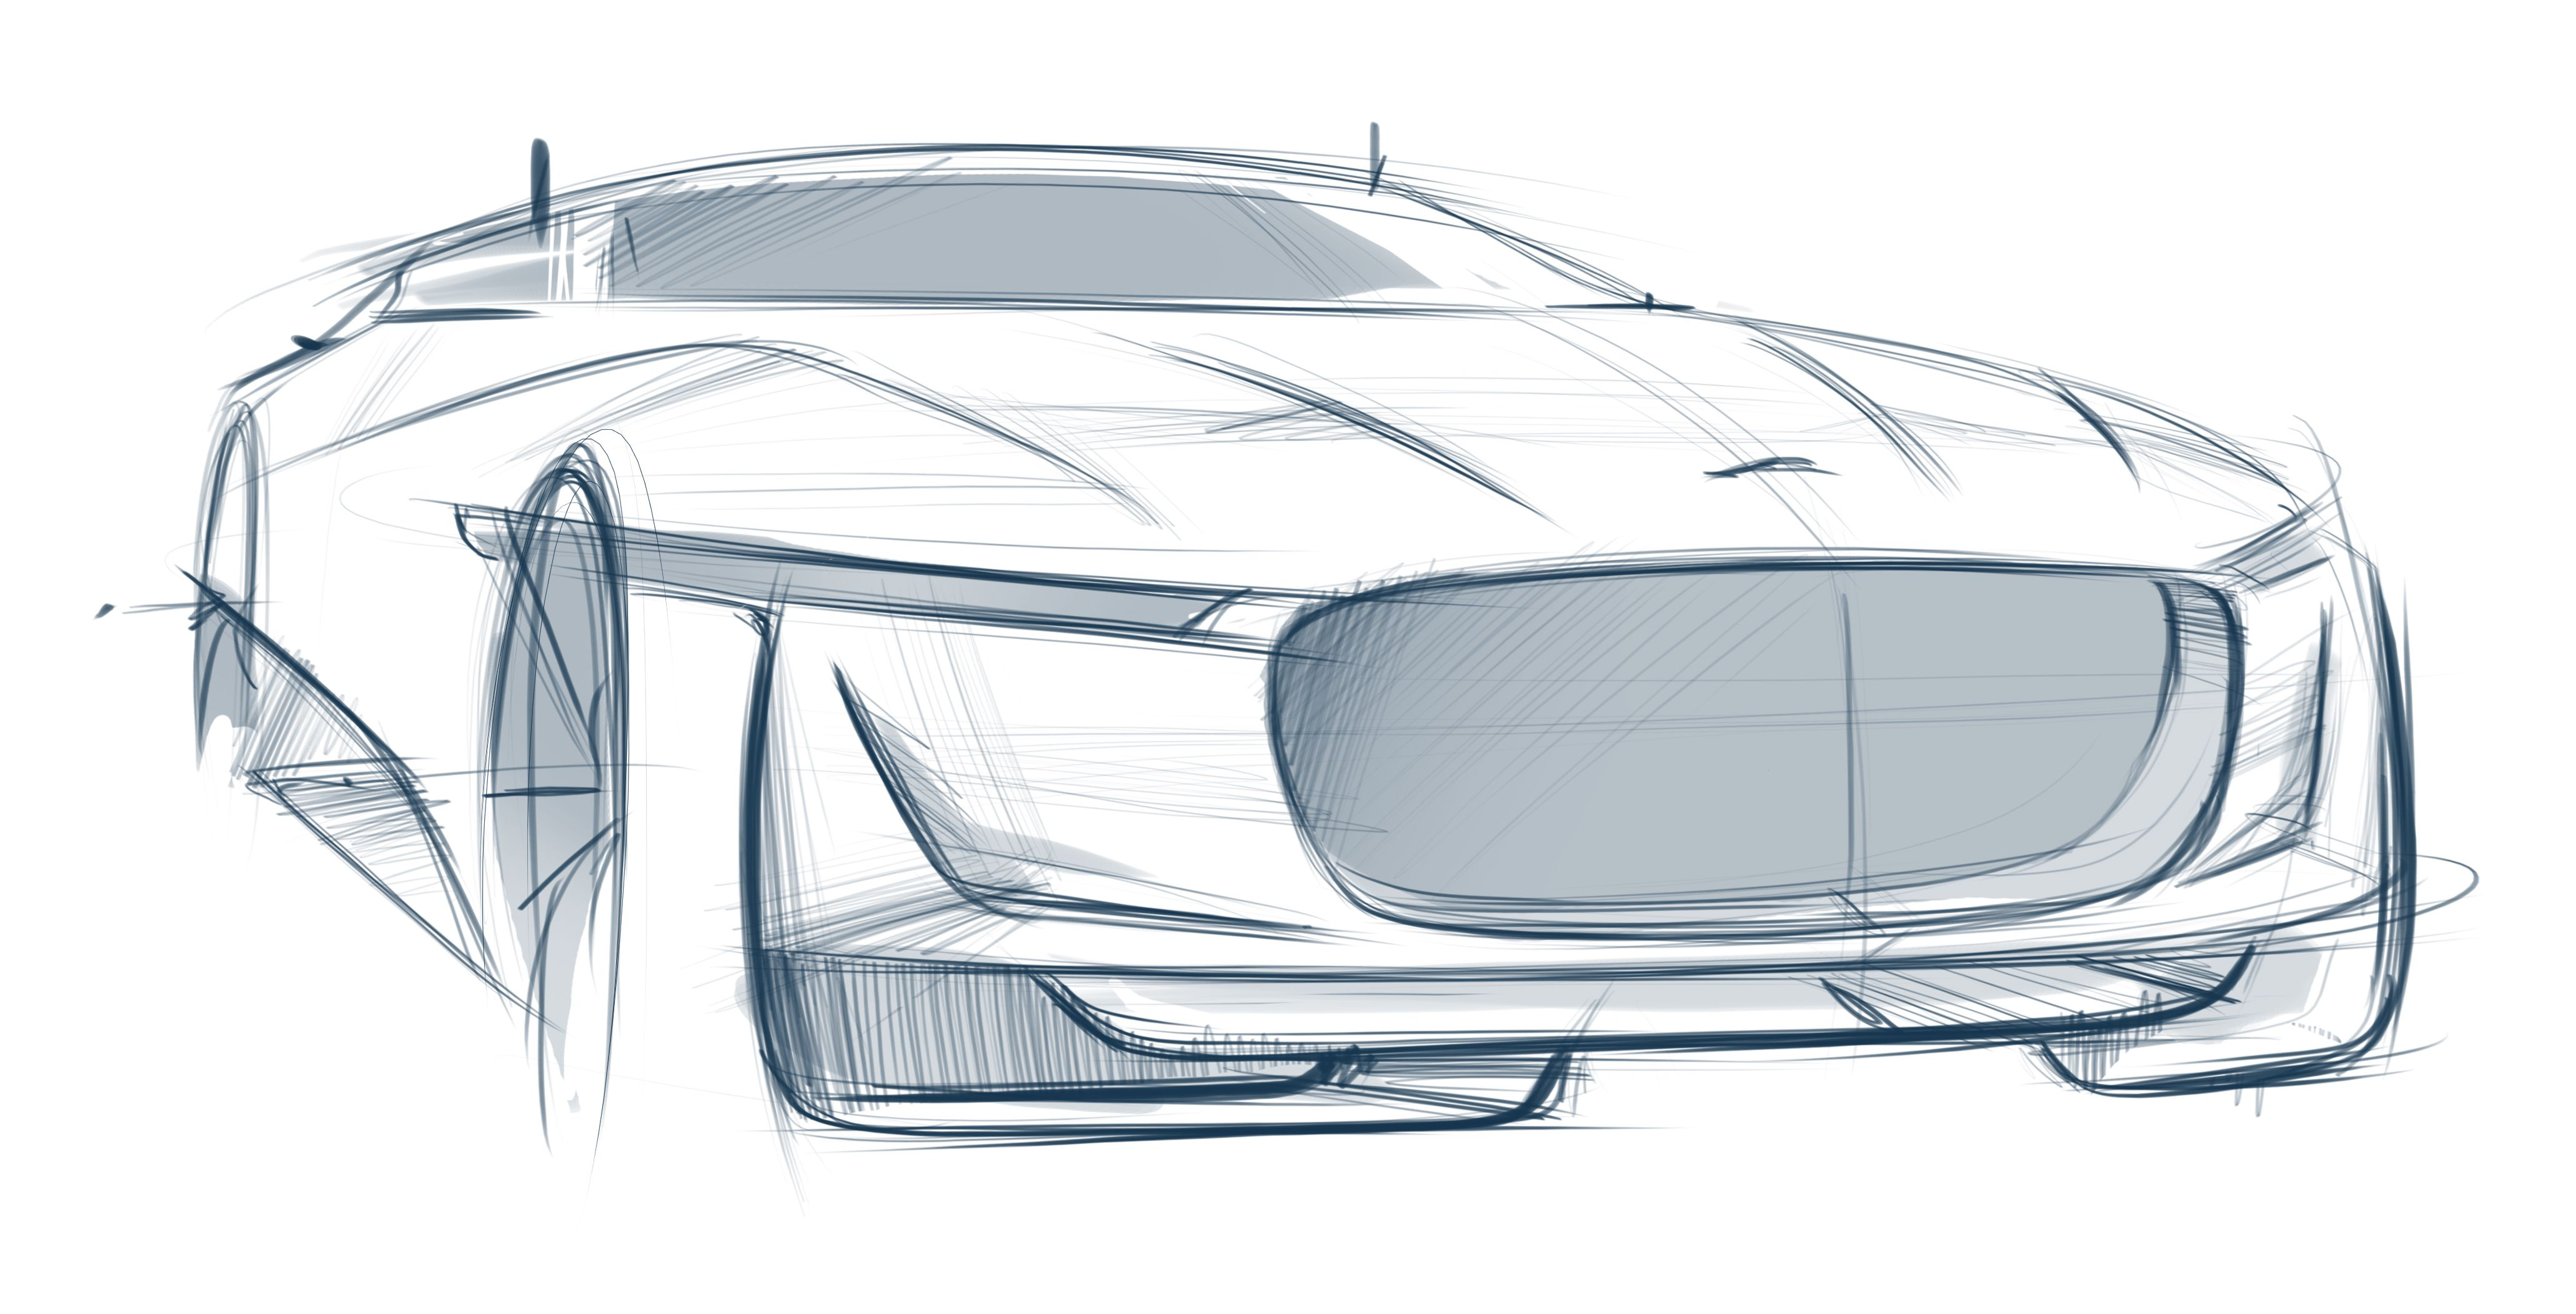 4123x2103 Jaguar E Luxury Concept Hot Sketches Car Design Sketch, Car